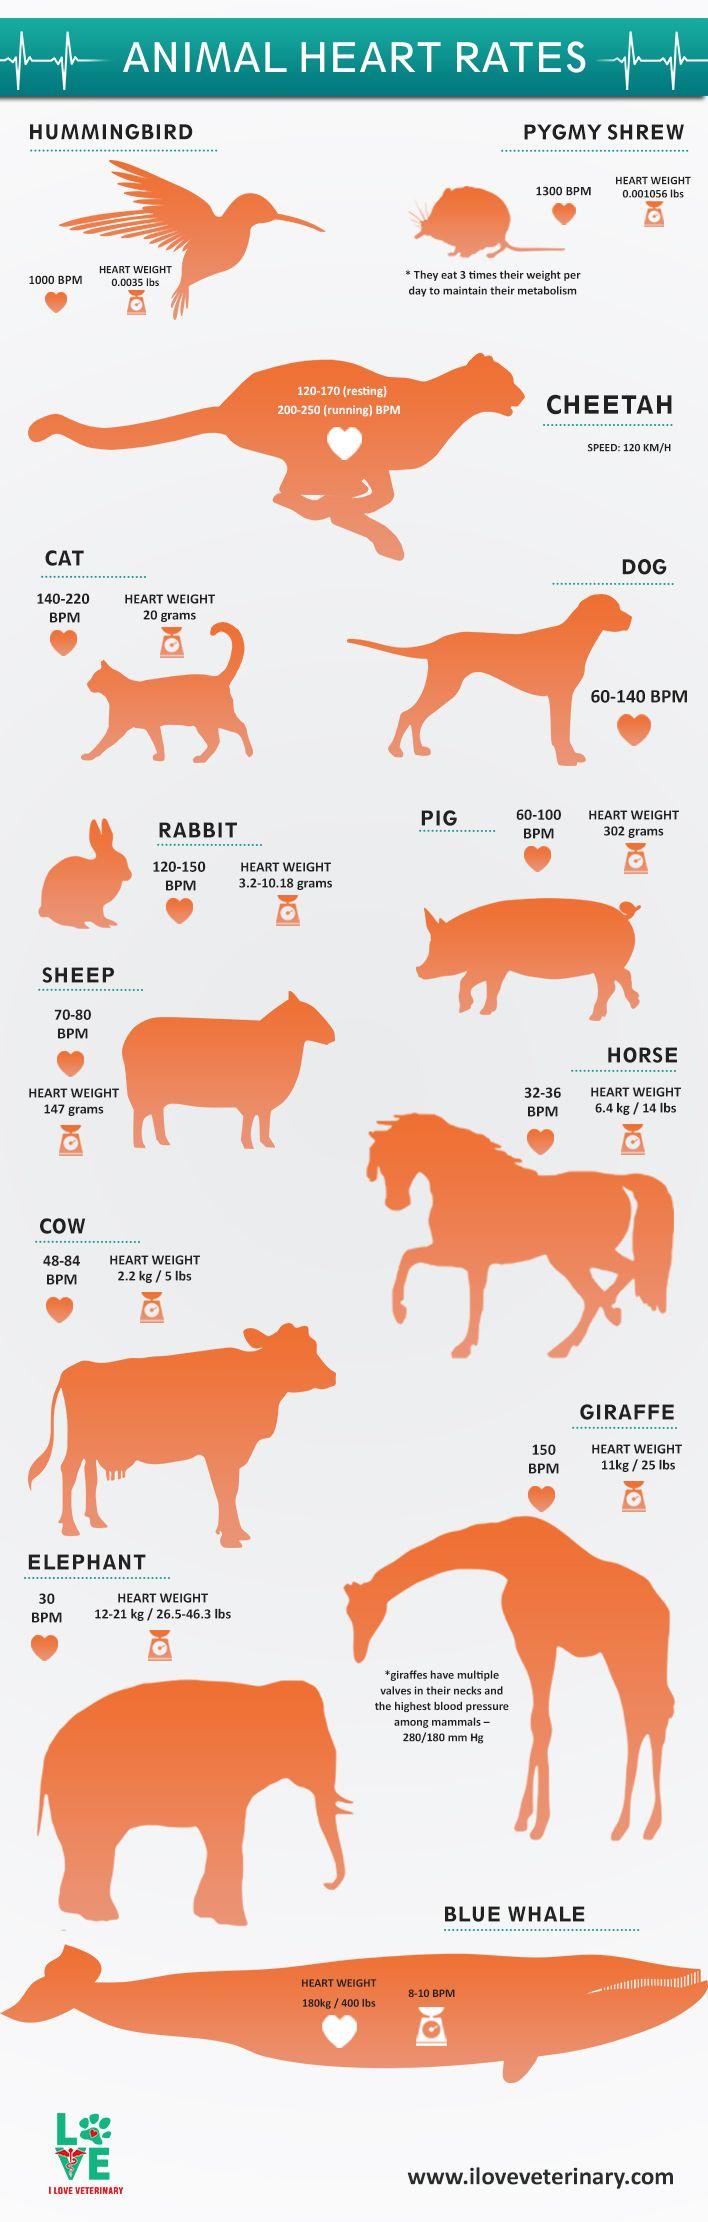 Animal Heart Rates Small Animal Anatomy Pinterest Heart Rate